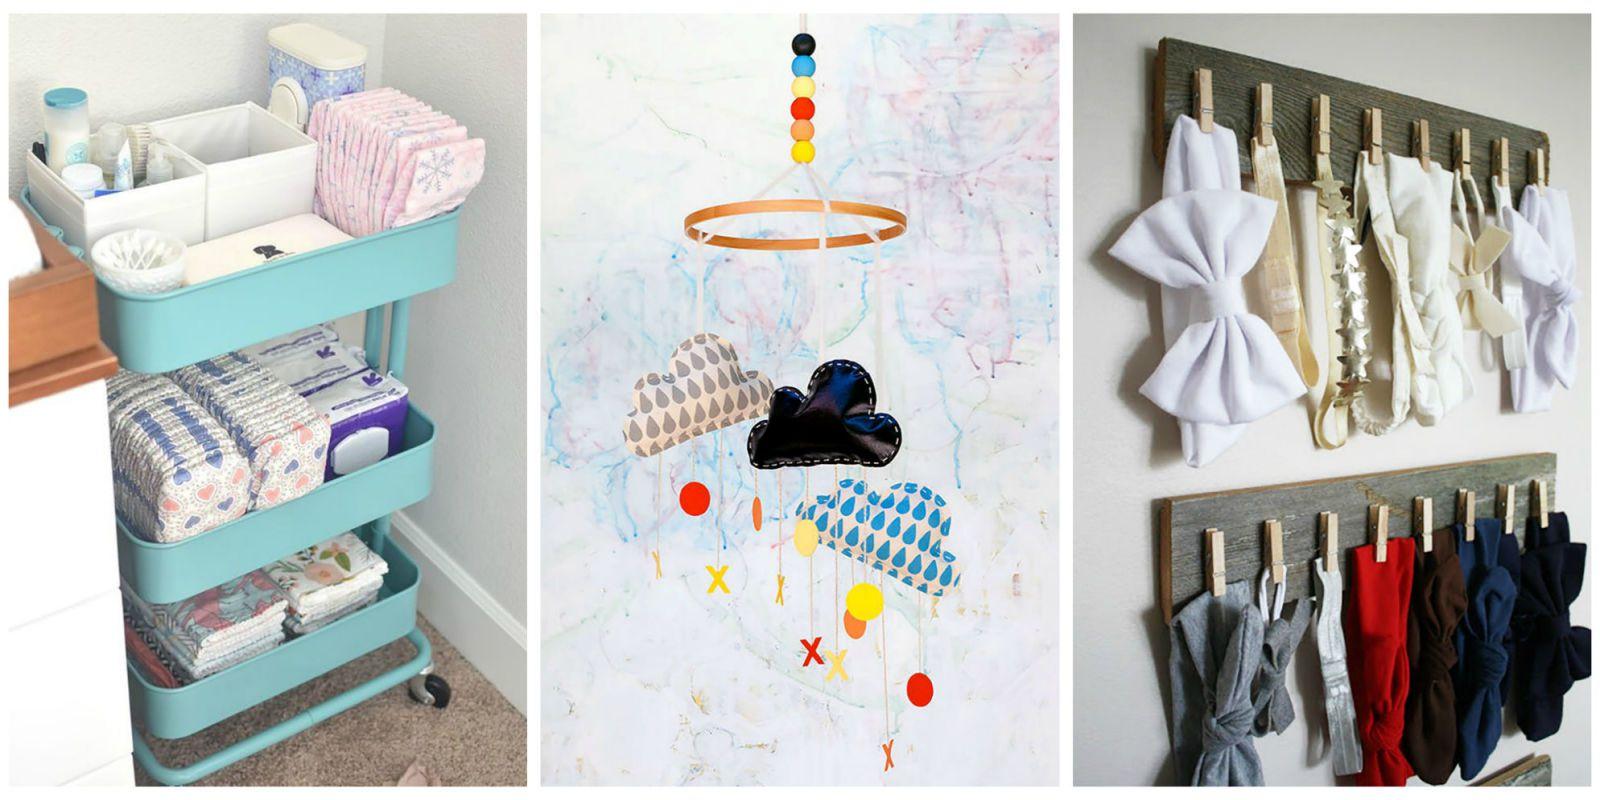 20 Best Baby Room Decor Ideas - Nursery Design, Organization, and